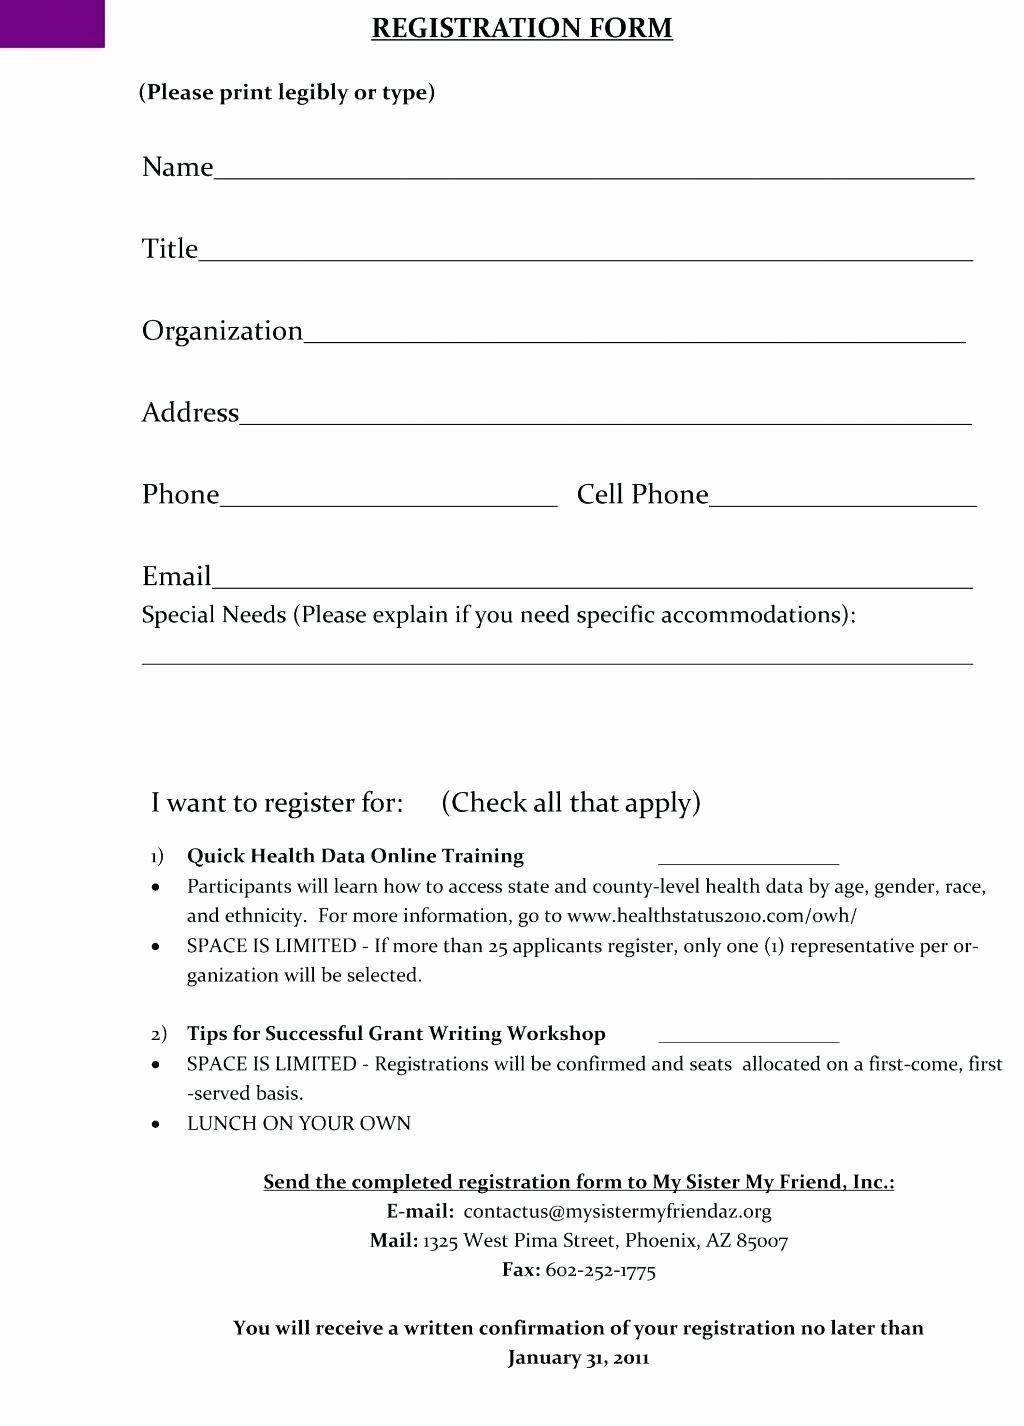 Training Registration form Template